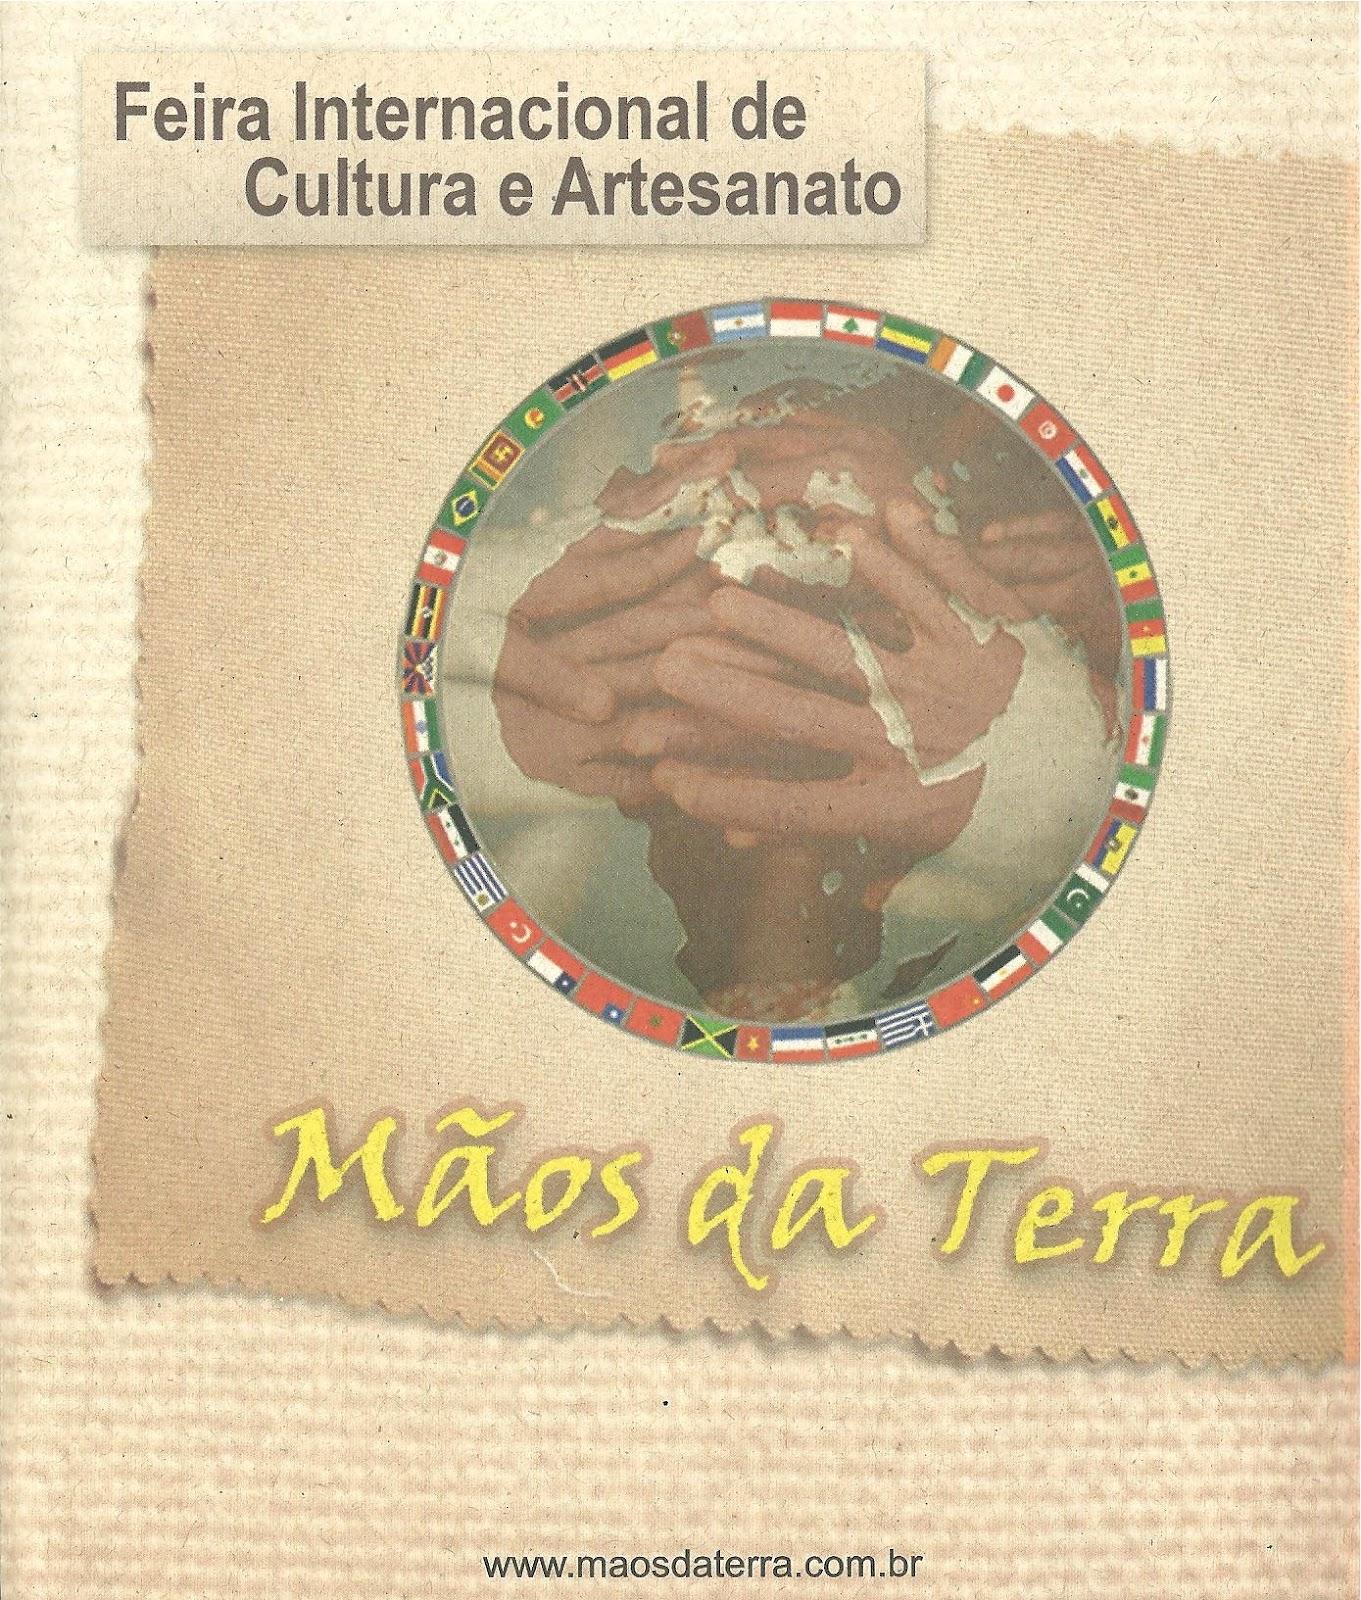 Aparadores Vintage El Corte Ingles ~ By Coruja Feira Internacional de Cultura e Artesanato!